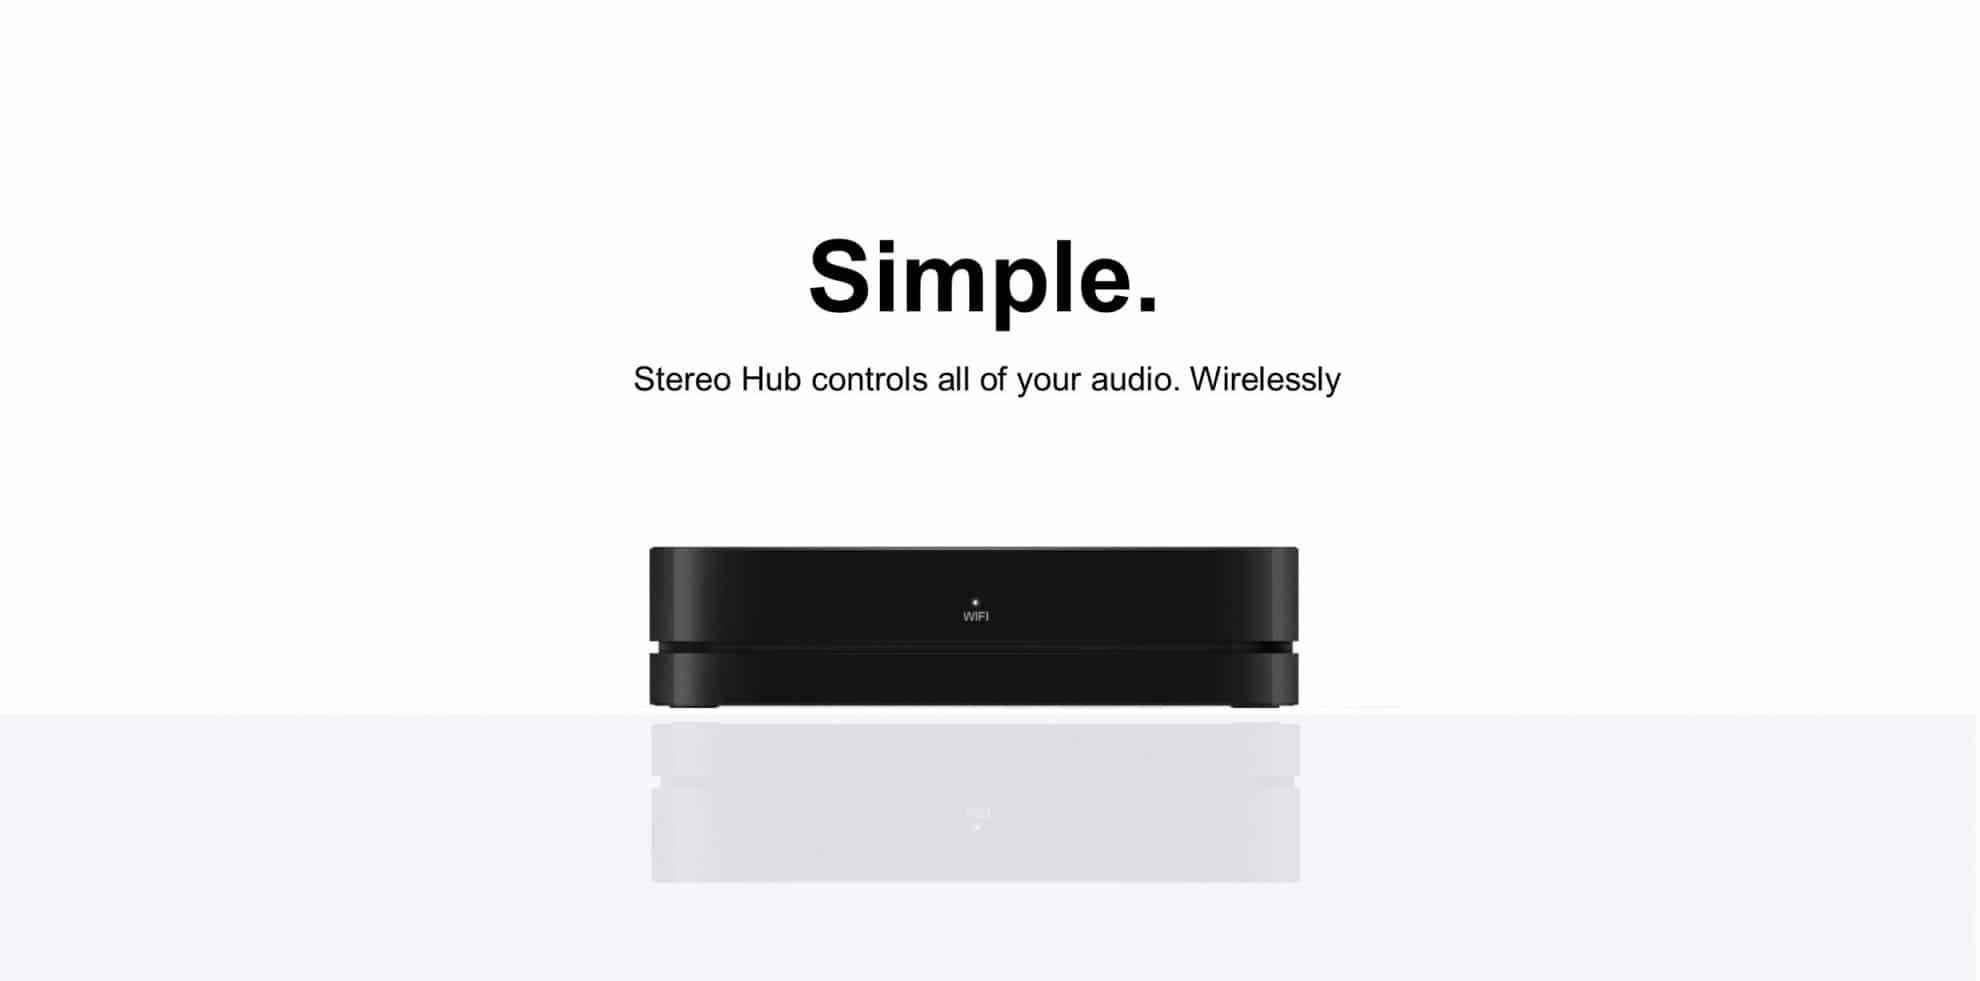 Stereo Hub Simple